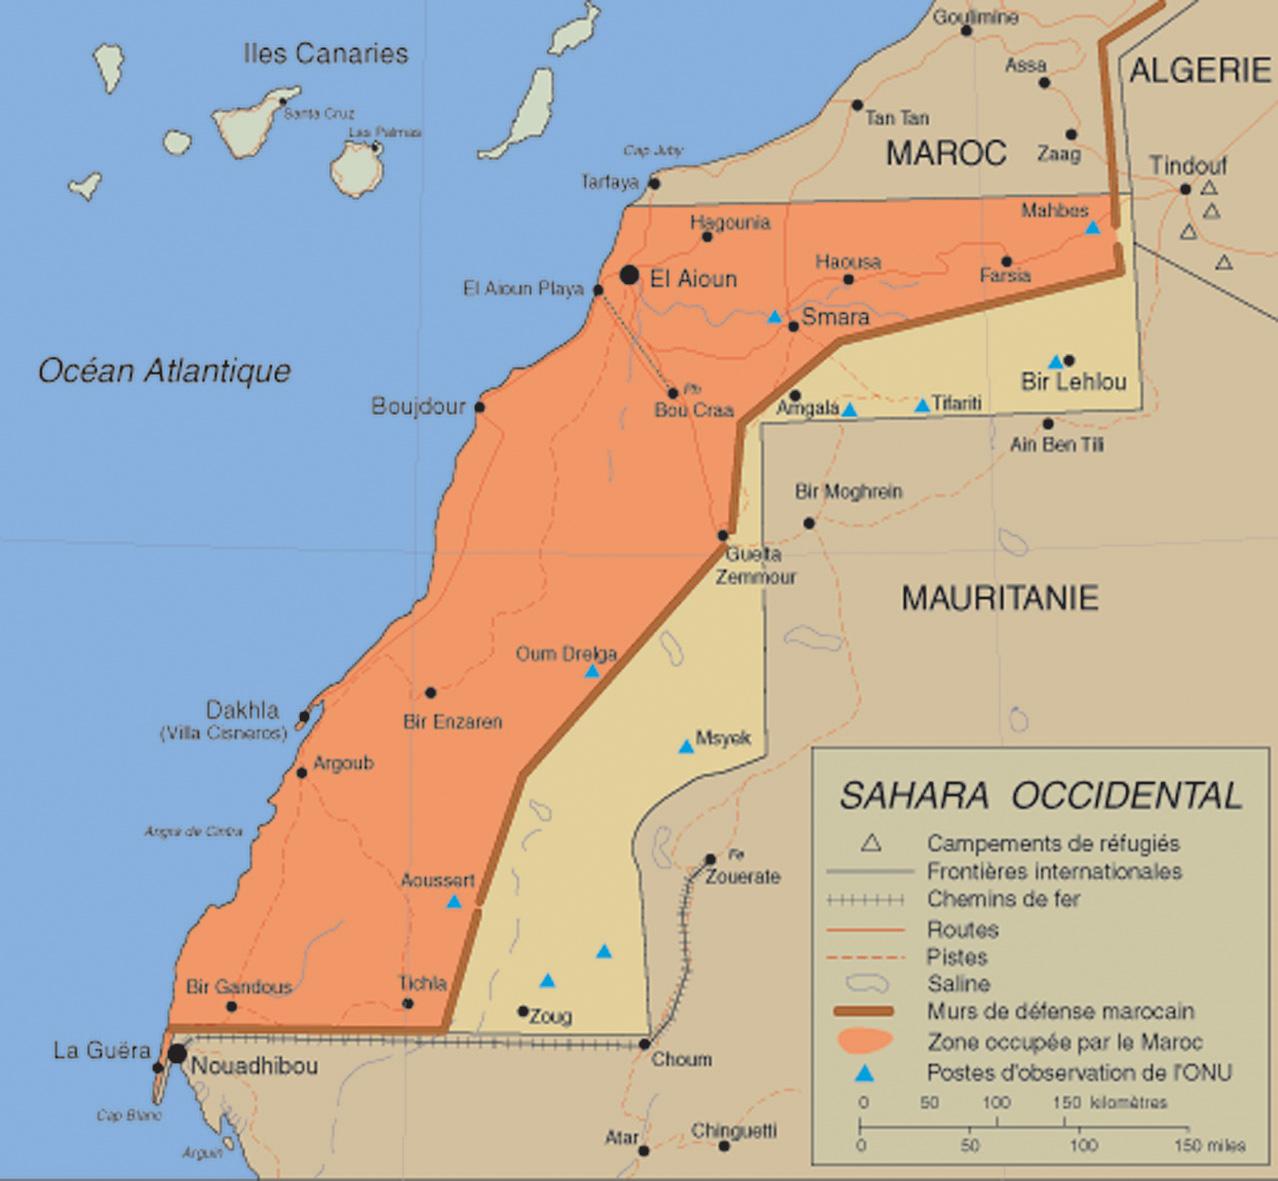 Sahara: Salud bet at home neukundenbonus 5 euro en Tierra Prestada